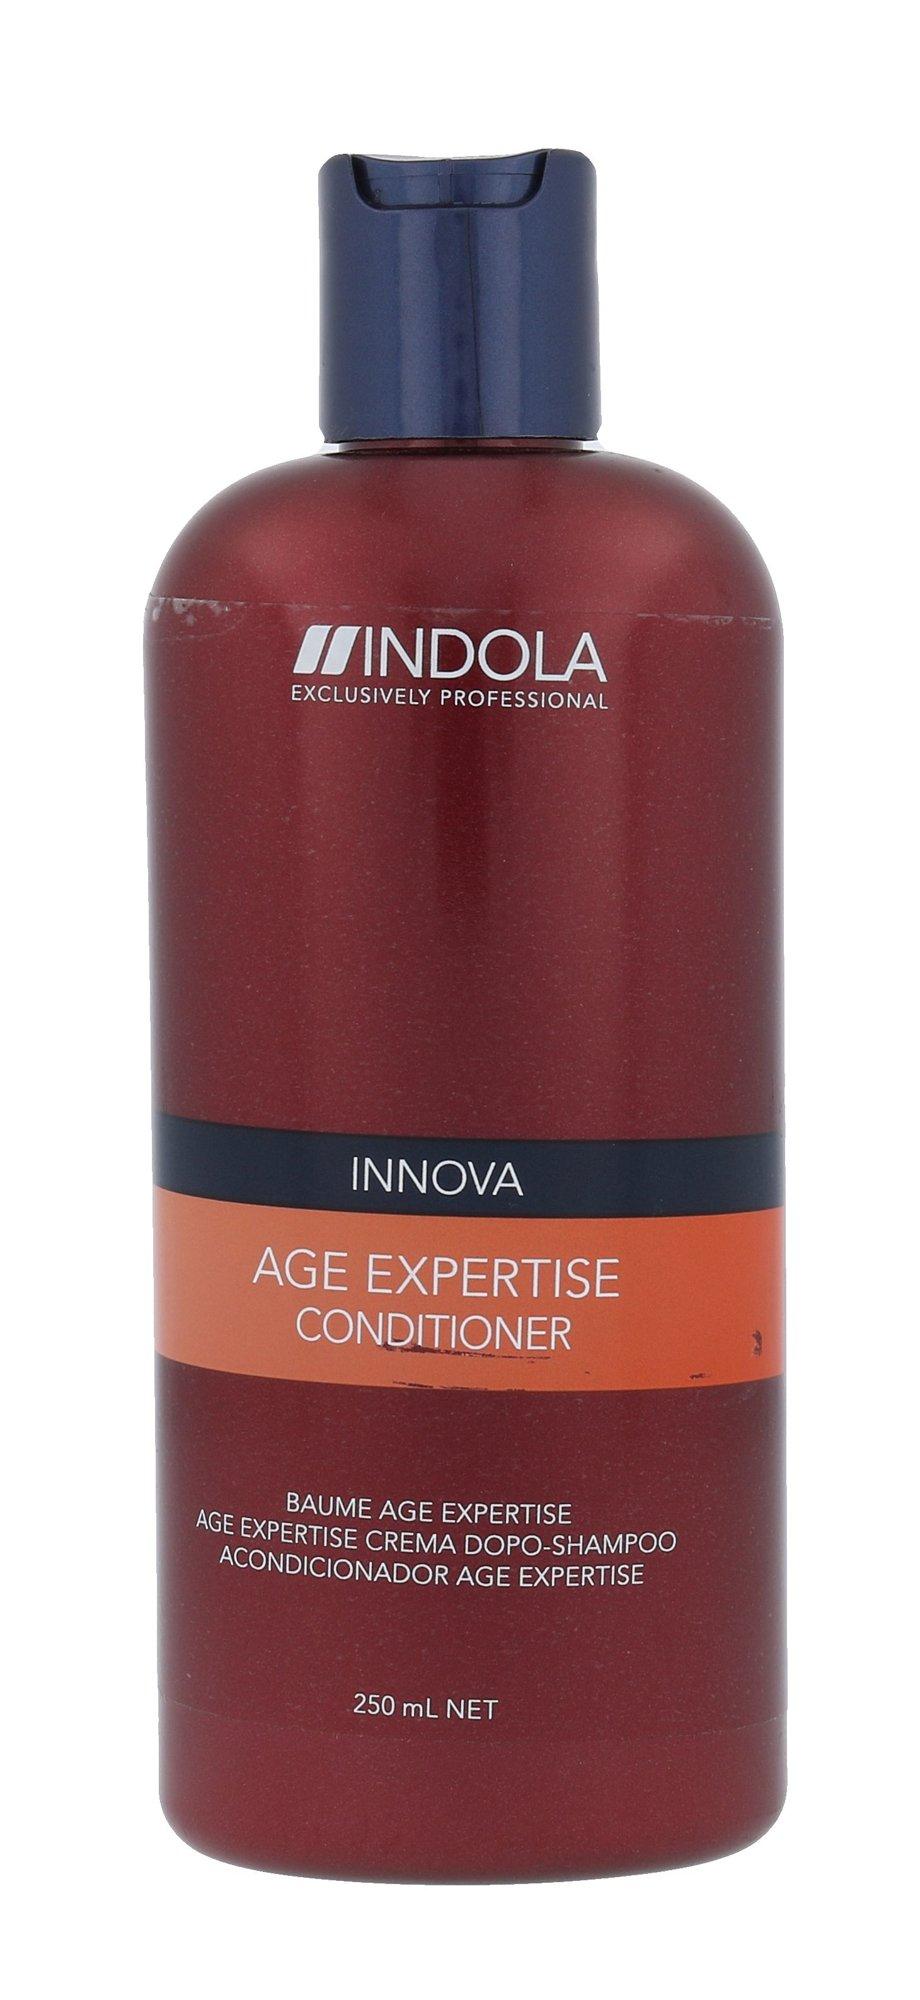 Indola Innova Age Expertise Cosmetic 250ml